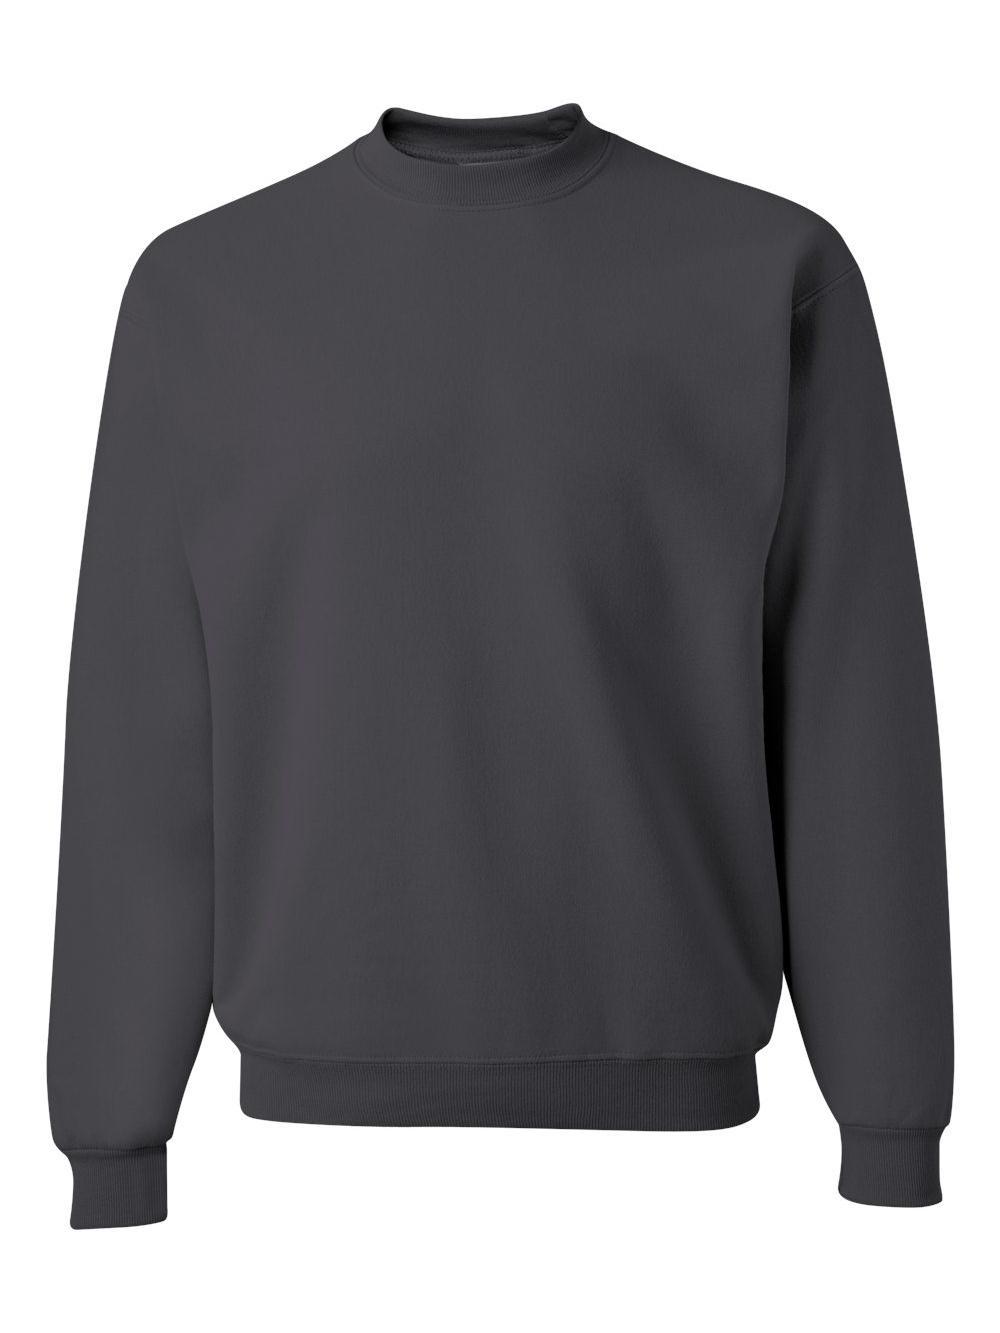 Jerzees-NuBlend-Crewneck-Sweatshirt-562MR thumbnail 21